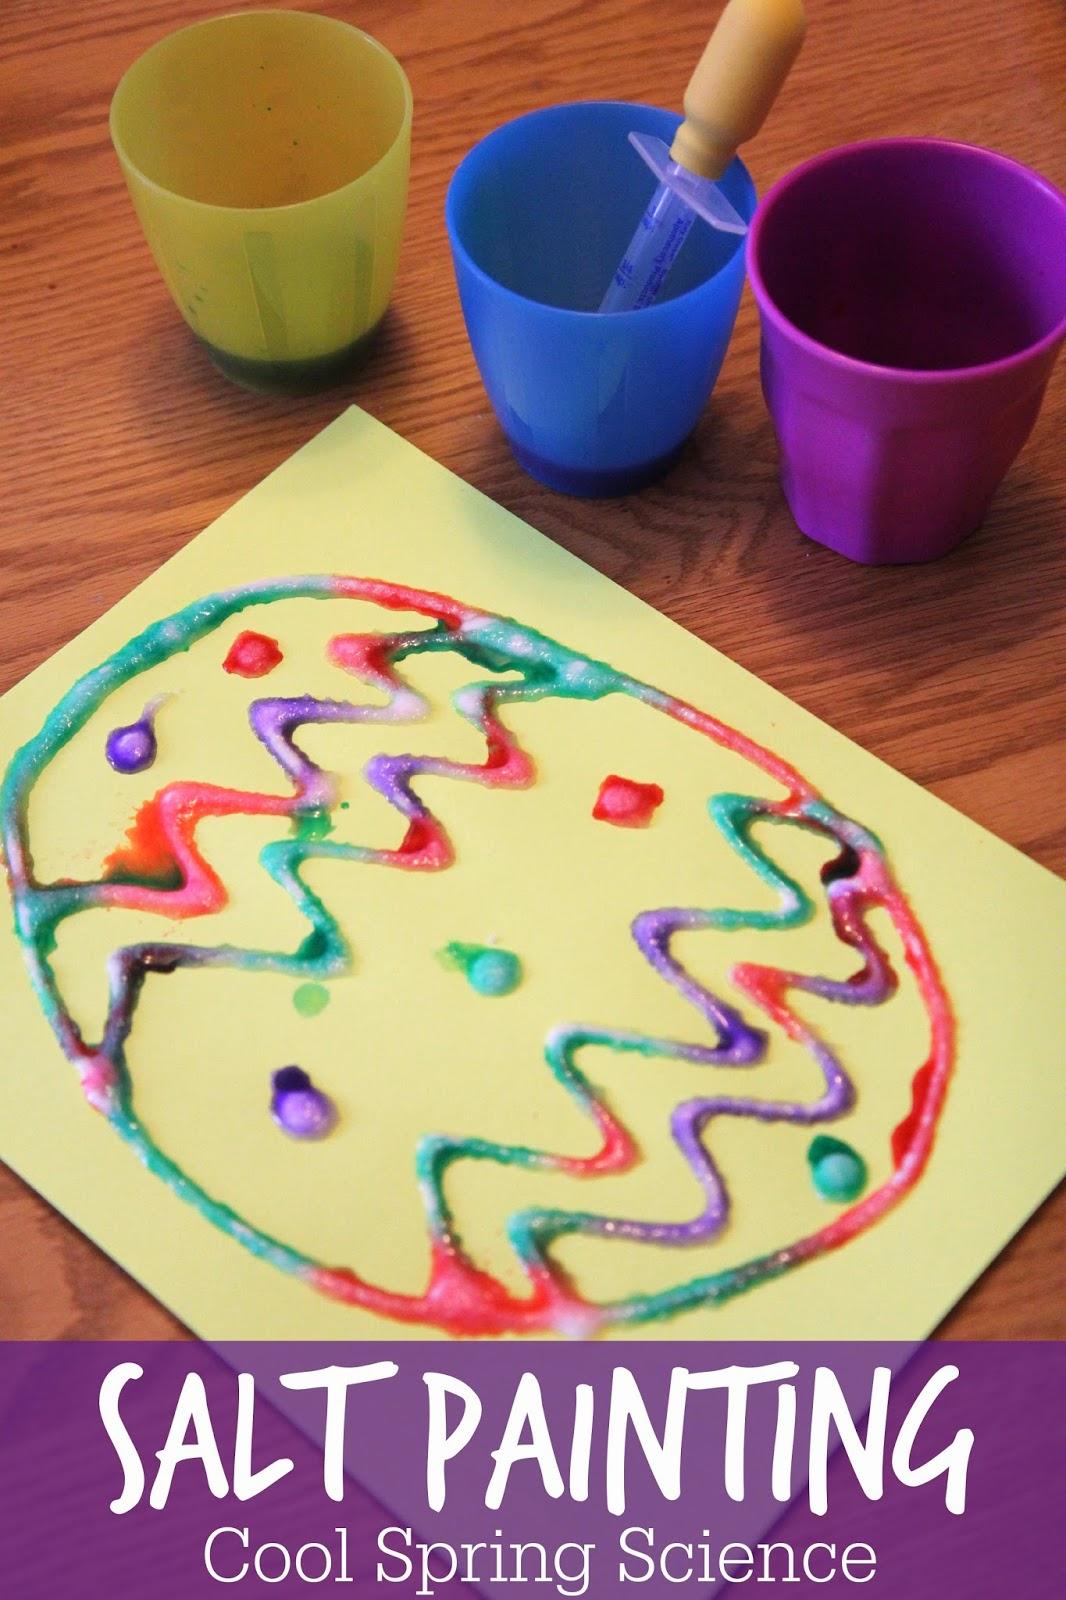 Kindness crafts for preschoolers - Cool Science Spring Salt Painting